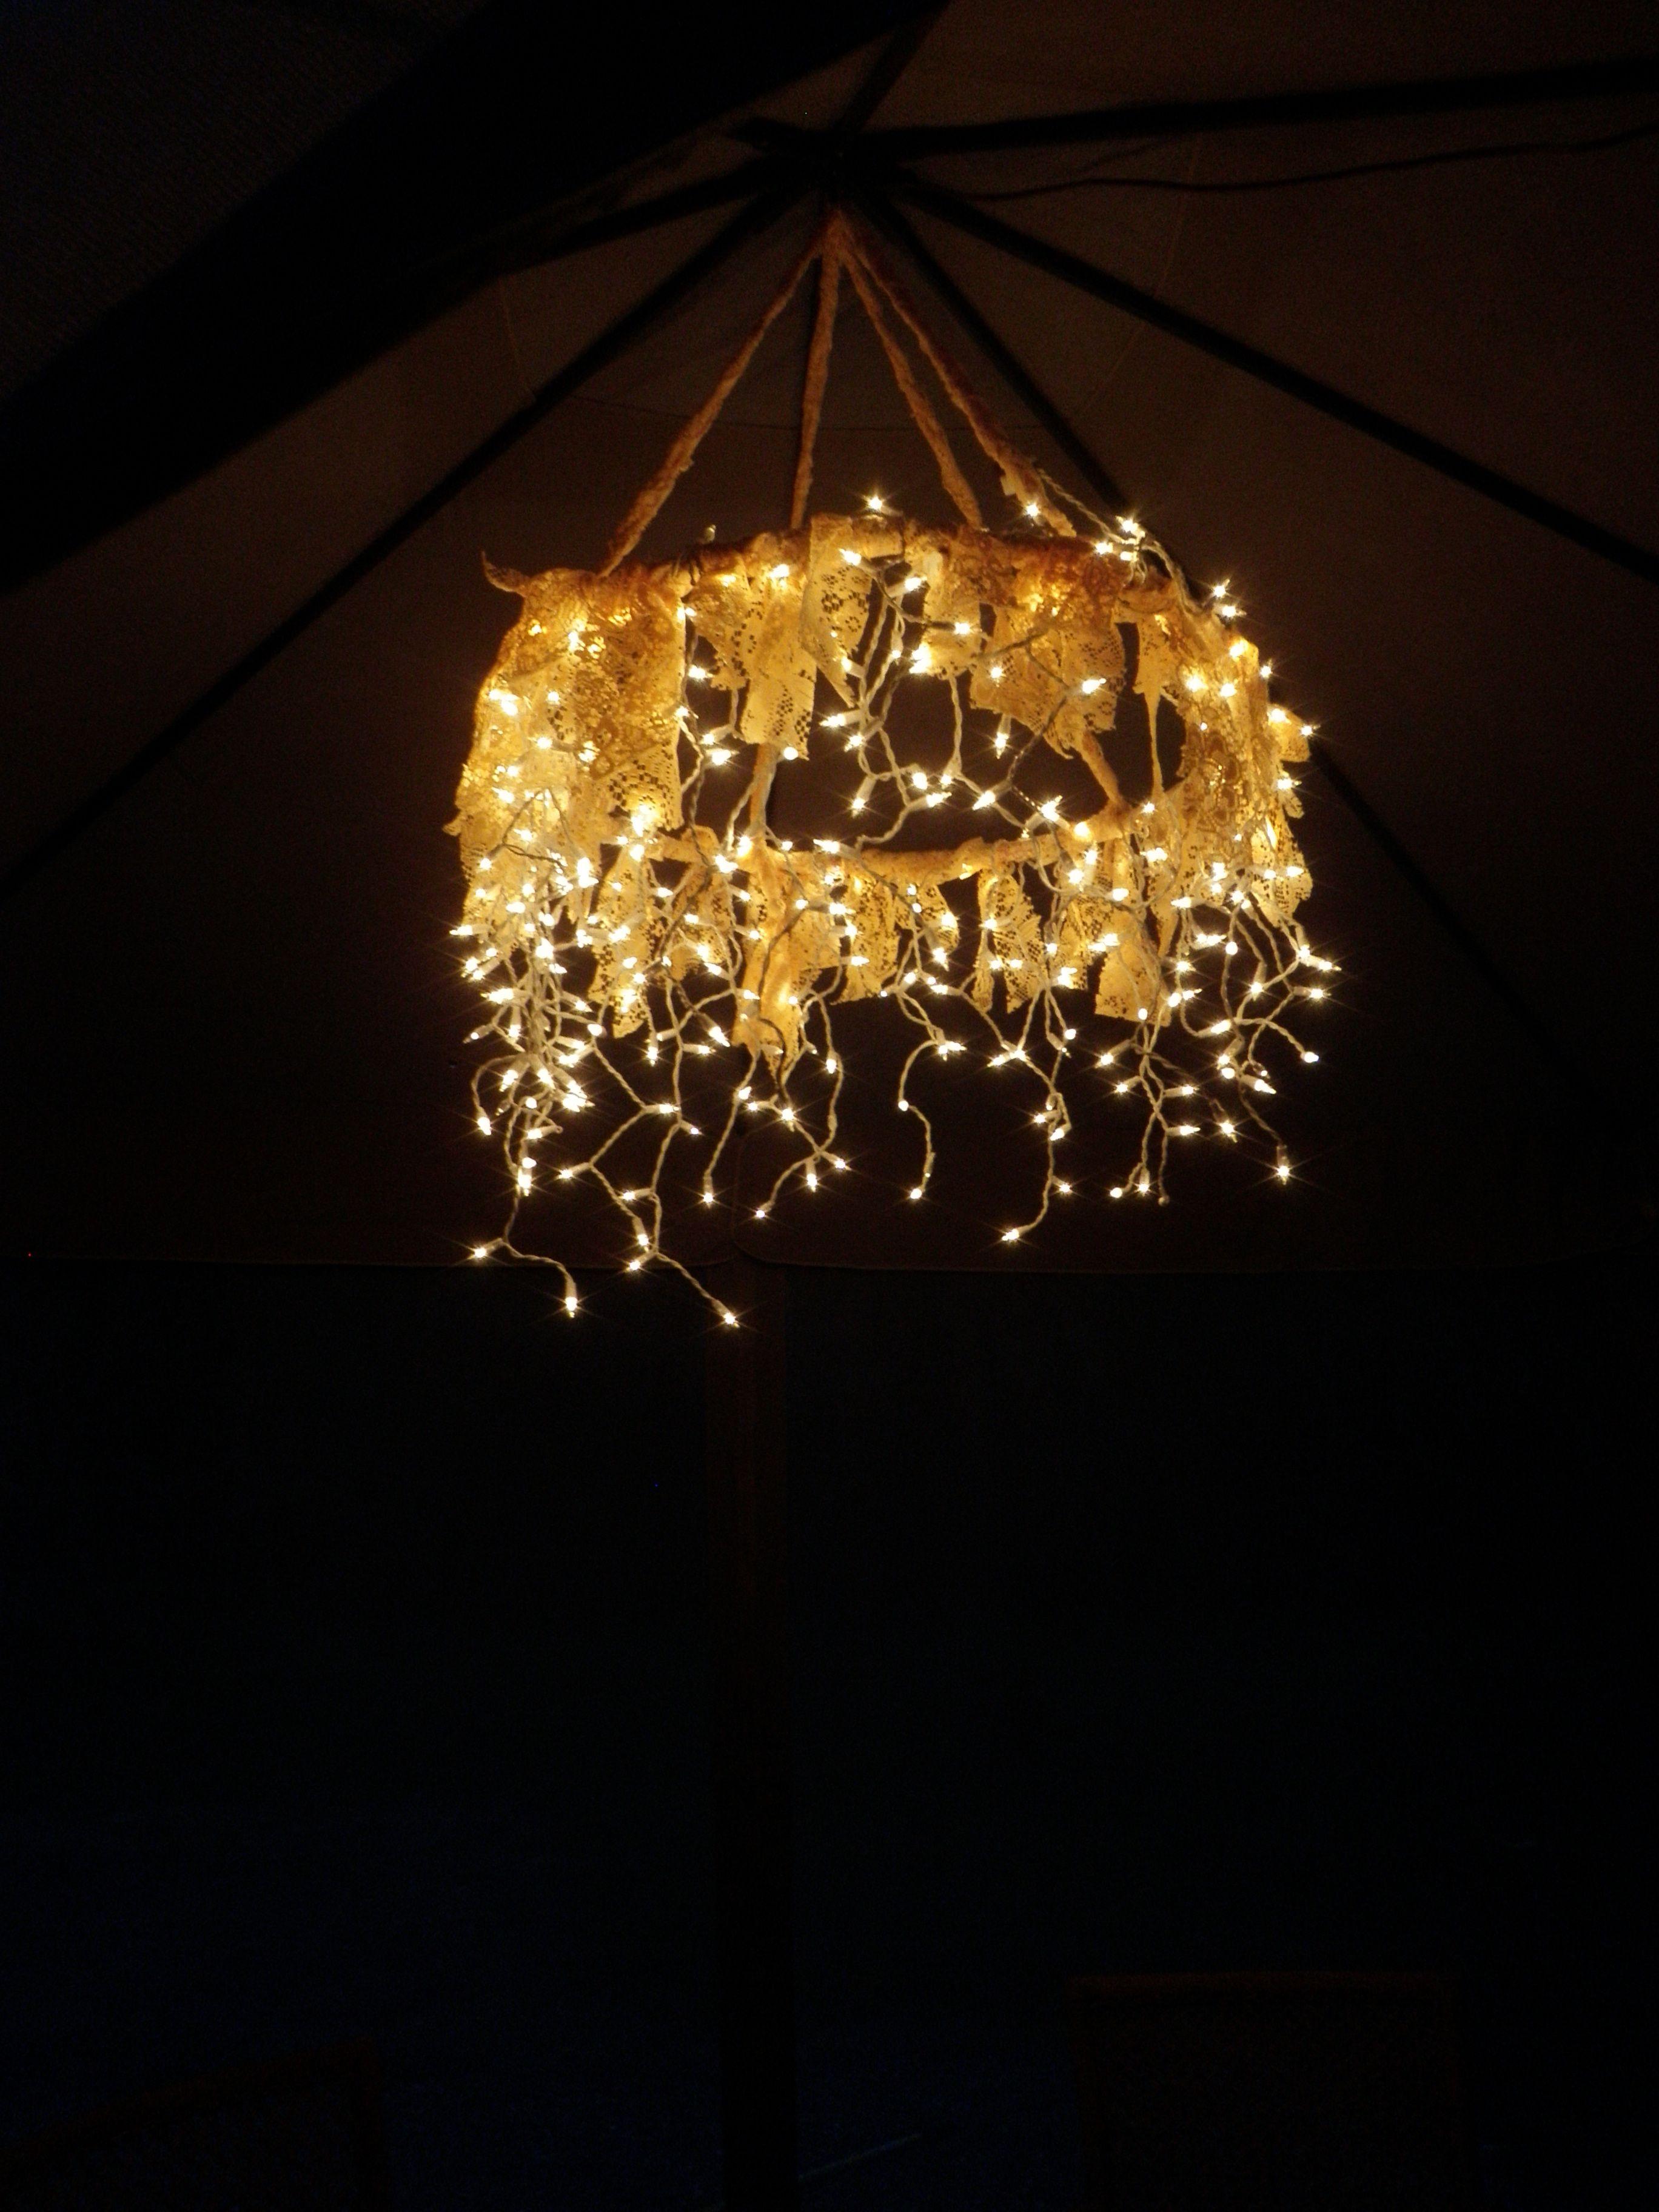 Hula Hoop Chandelier Hula hoop icicle lights and a lace curtain